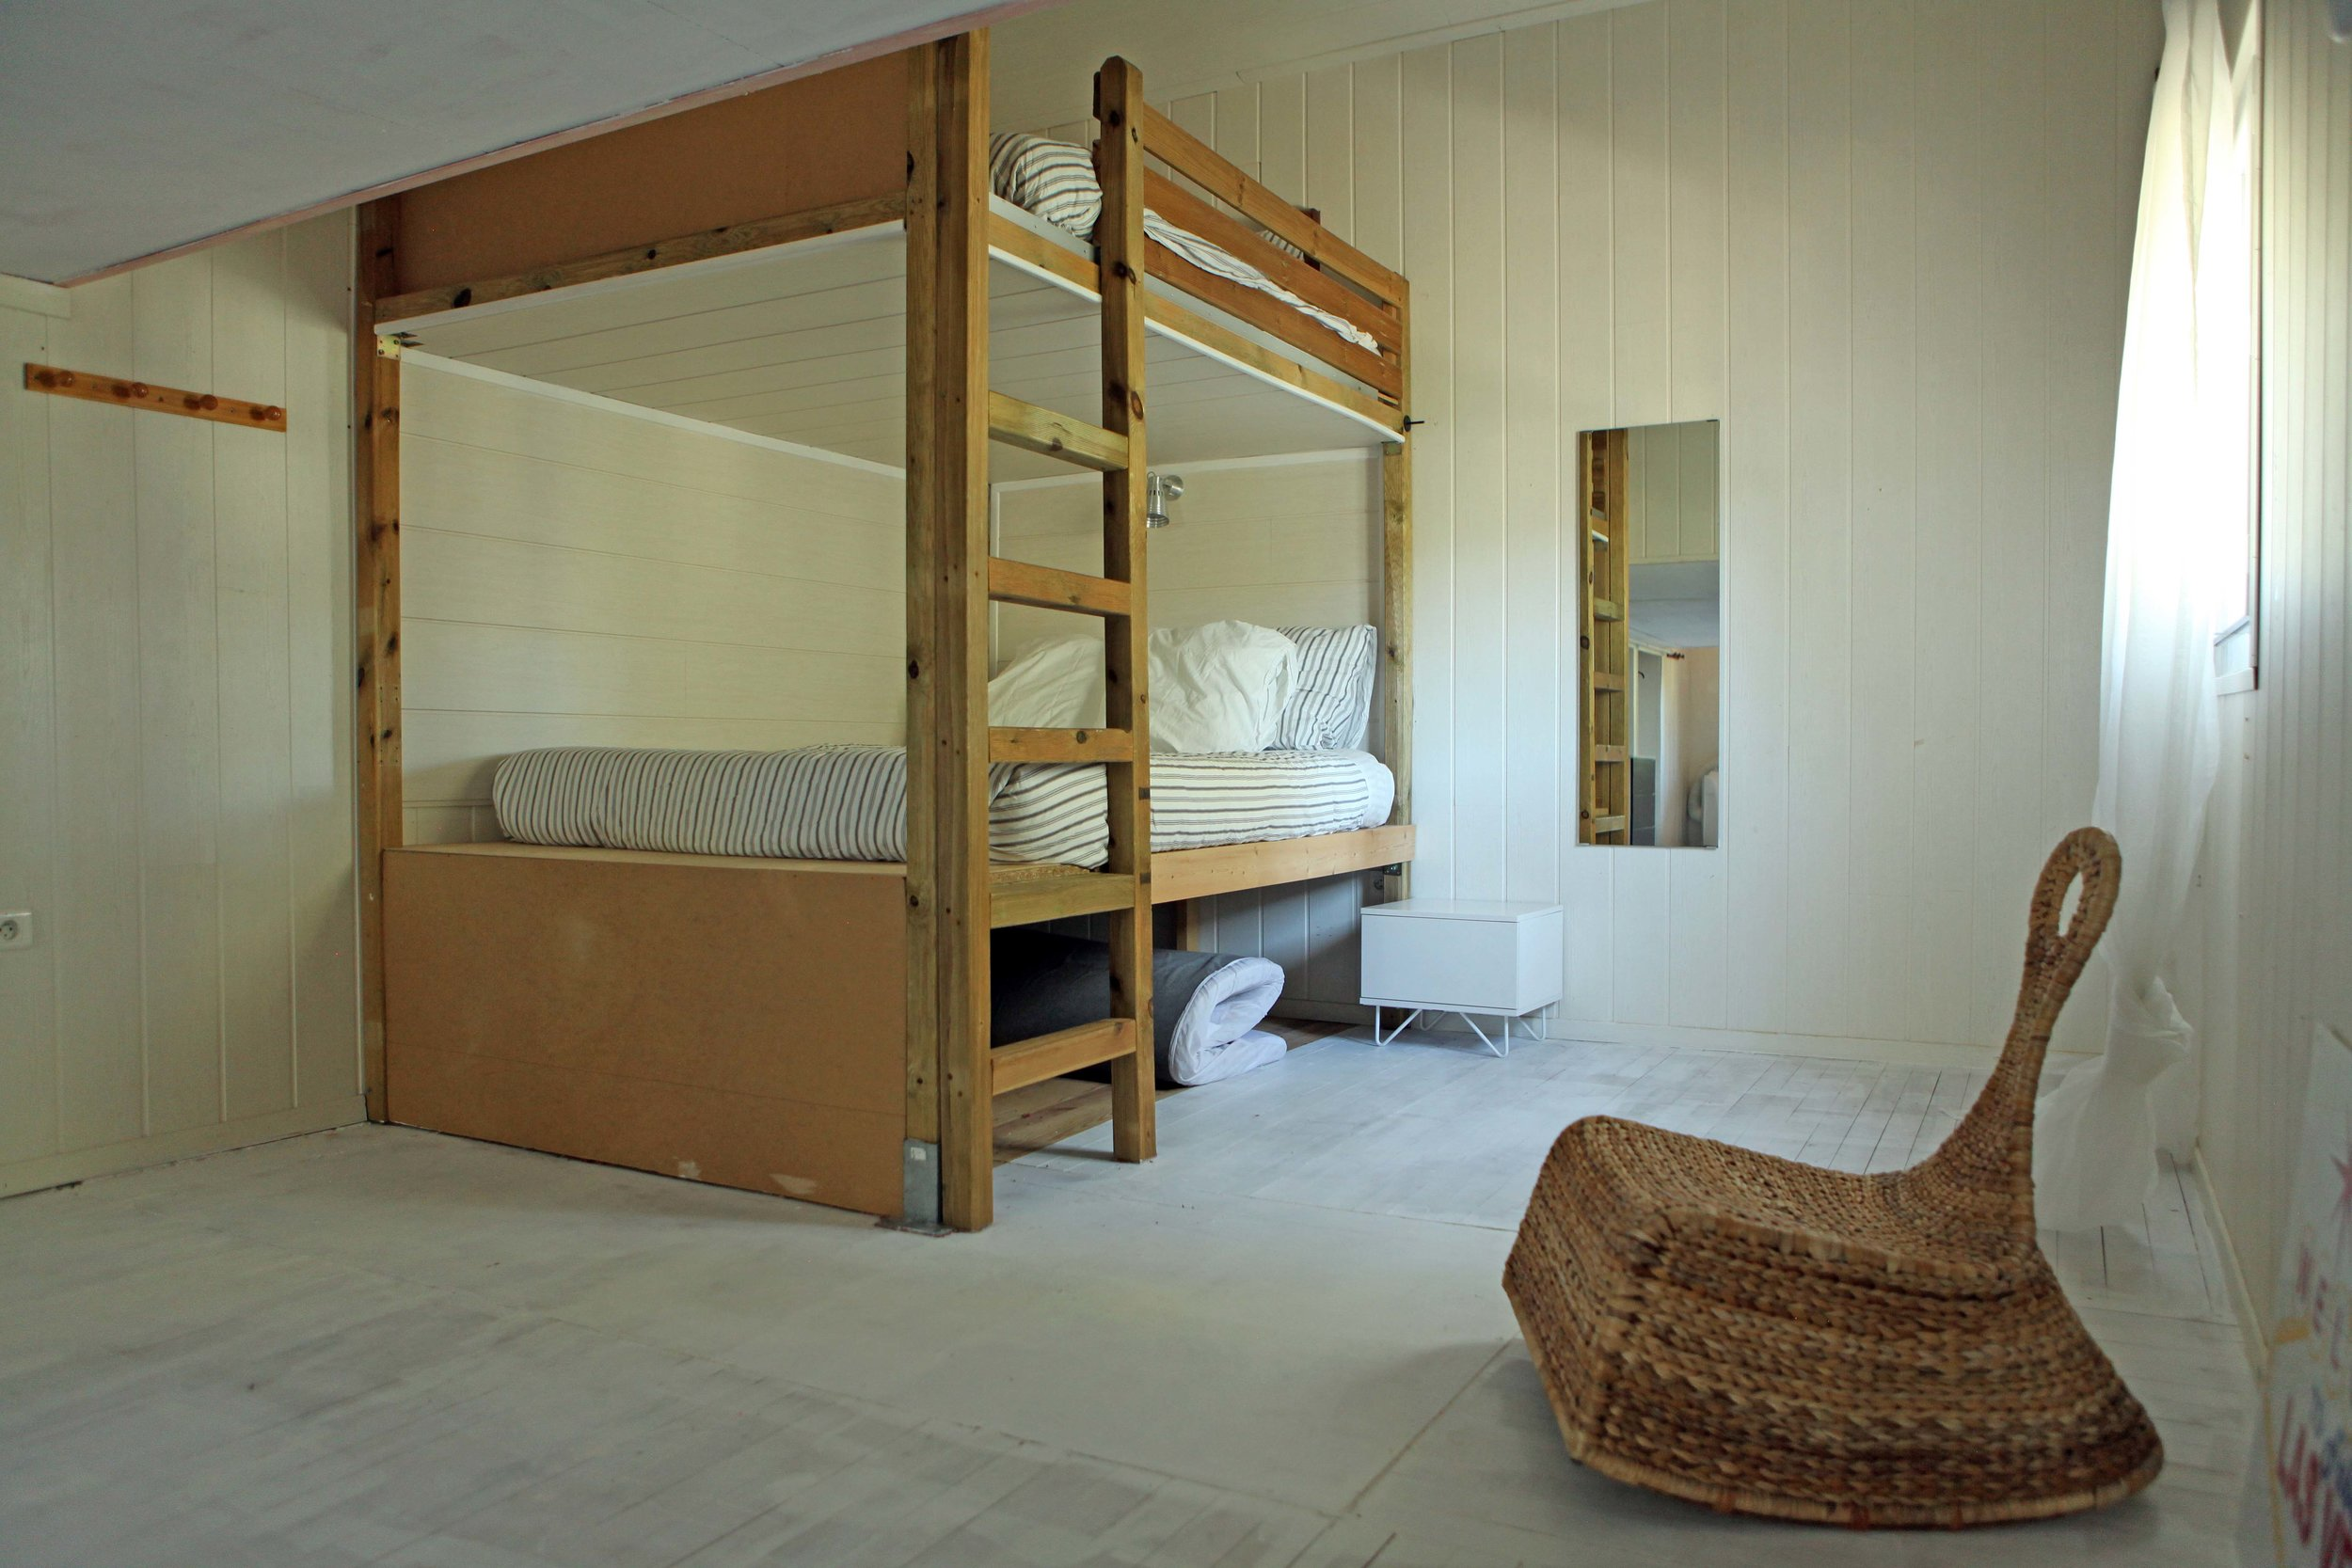 Dorm Room - 2 Queen size bunks, 2 double beds, sitting area